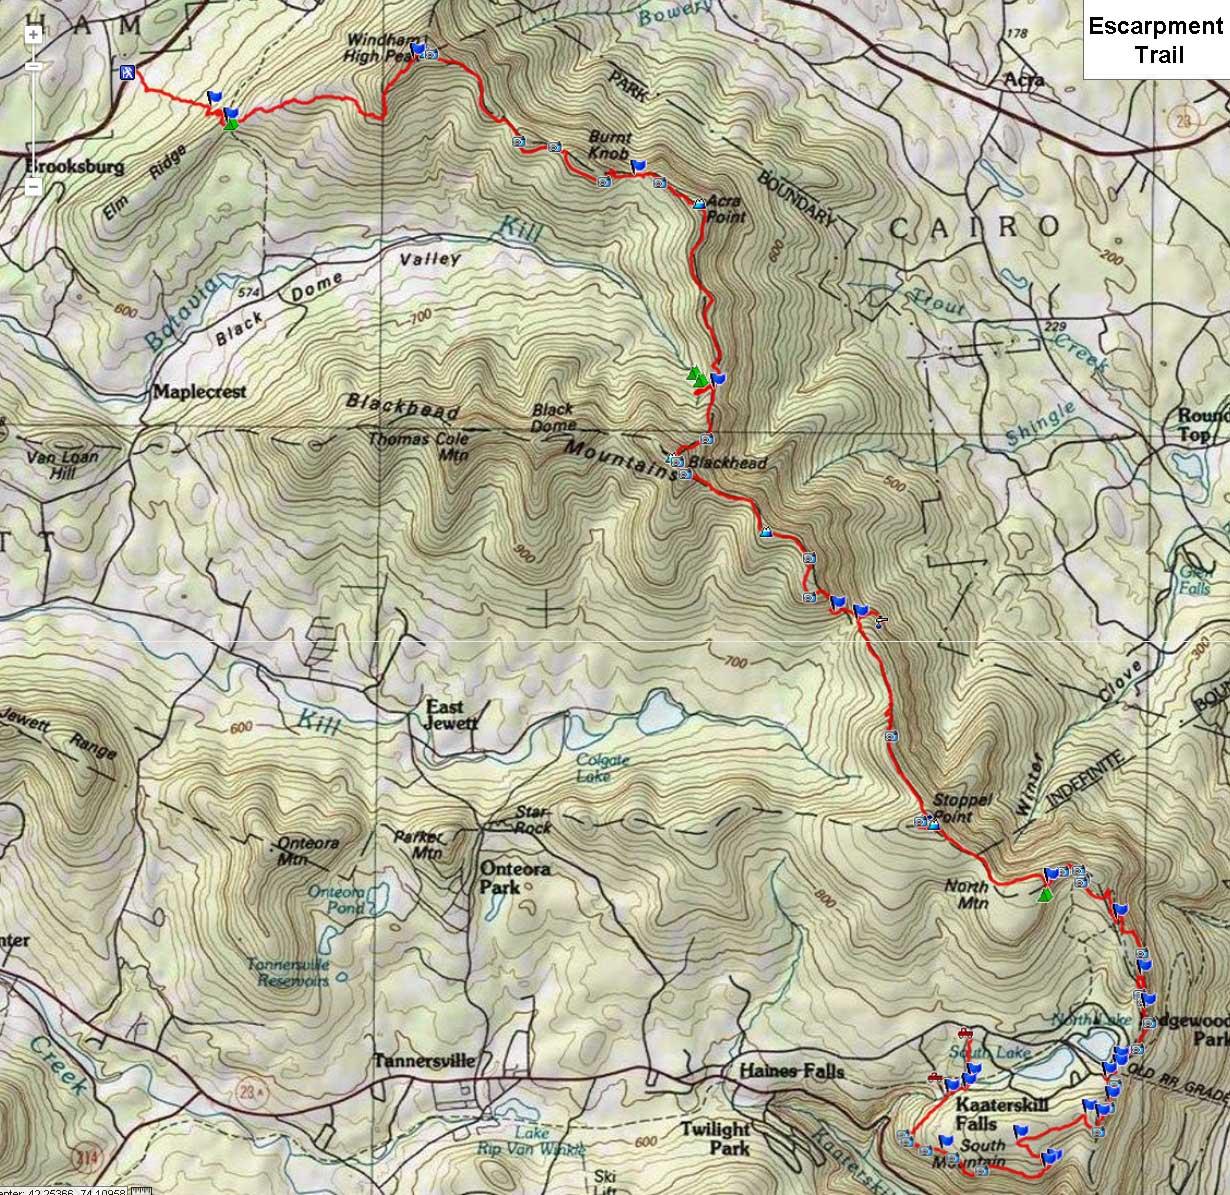 Eastern Escarpment Trail - Catskill Mountains on